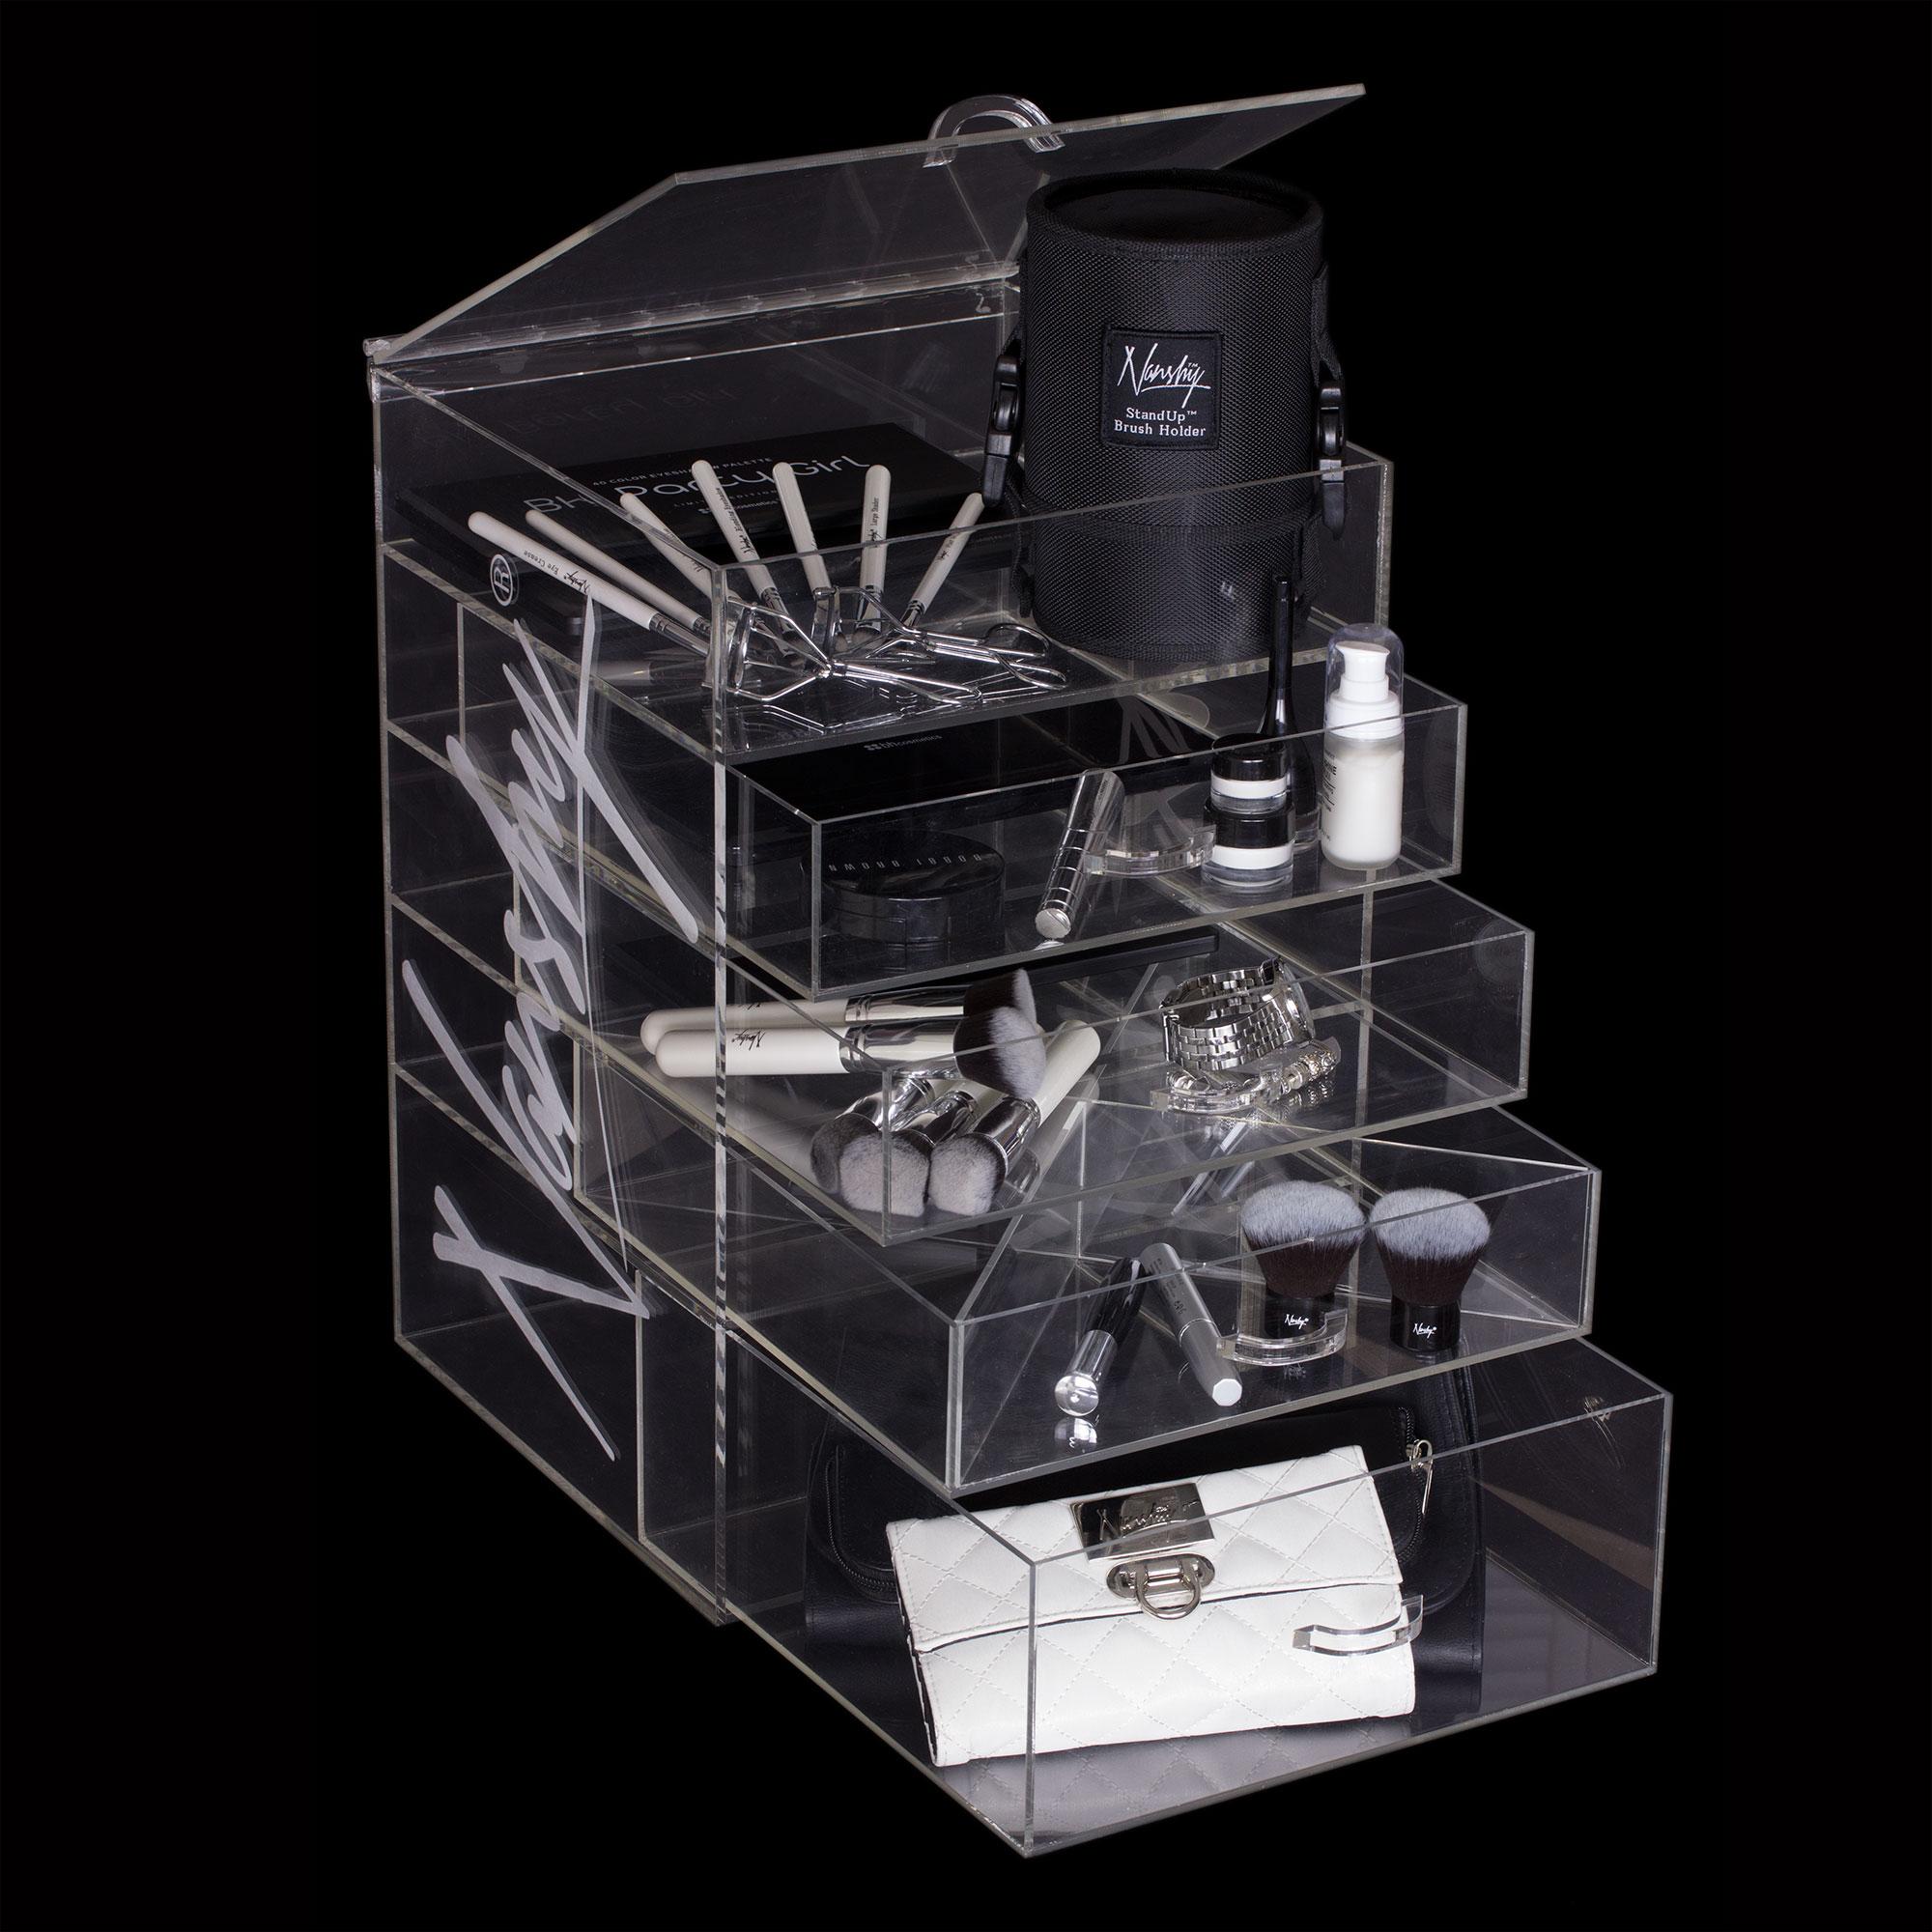 Nanshy Offers Similar Kardashian Acrylic Makeup Organizer